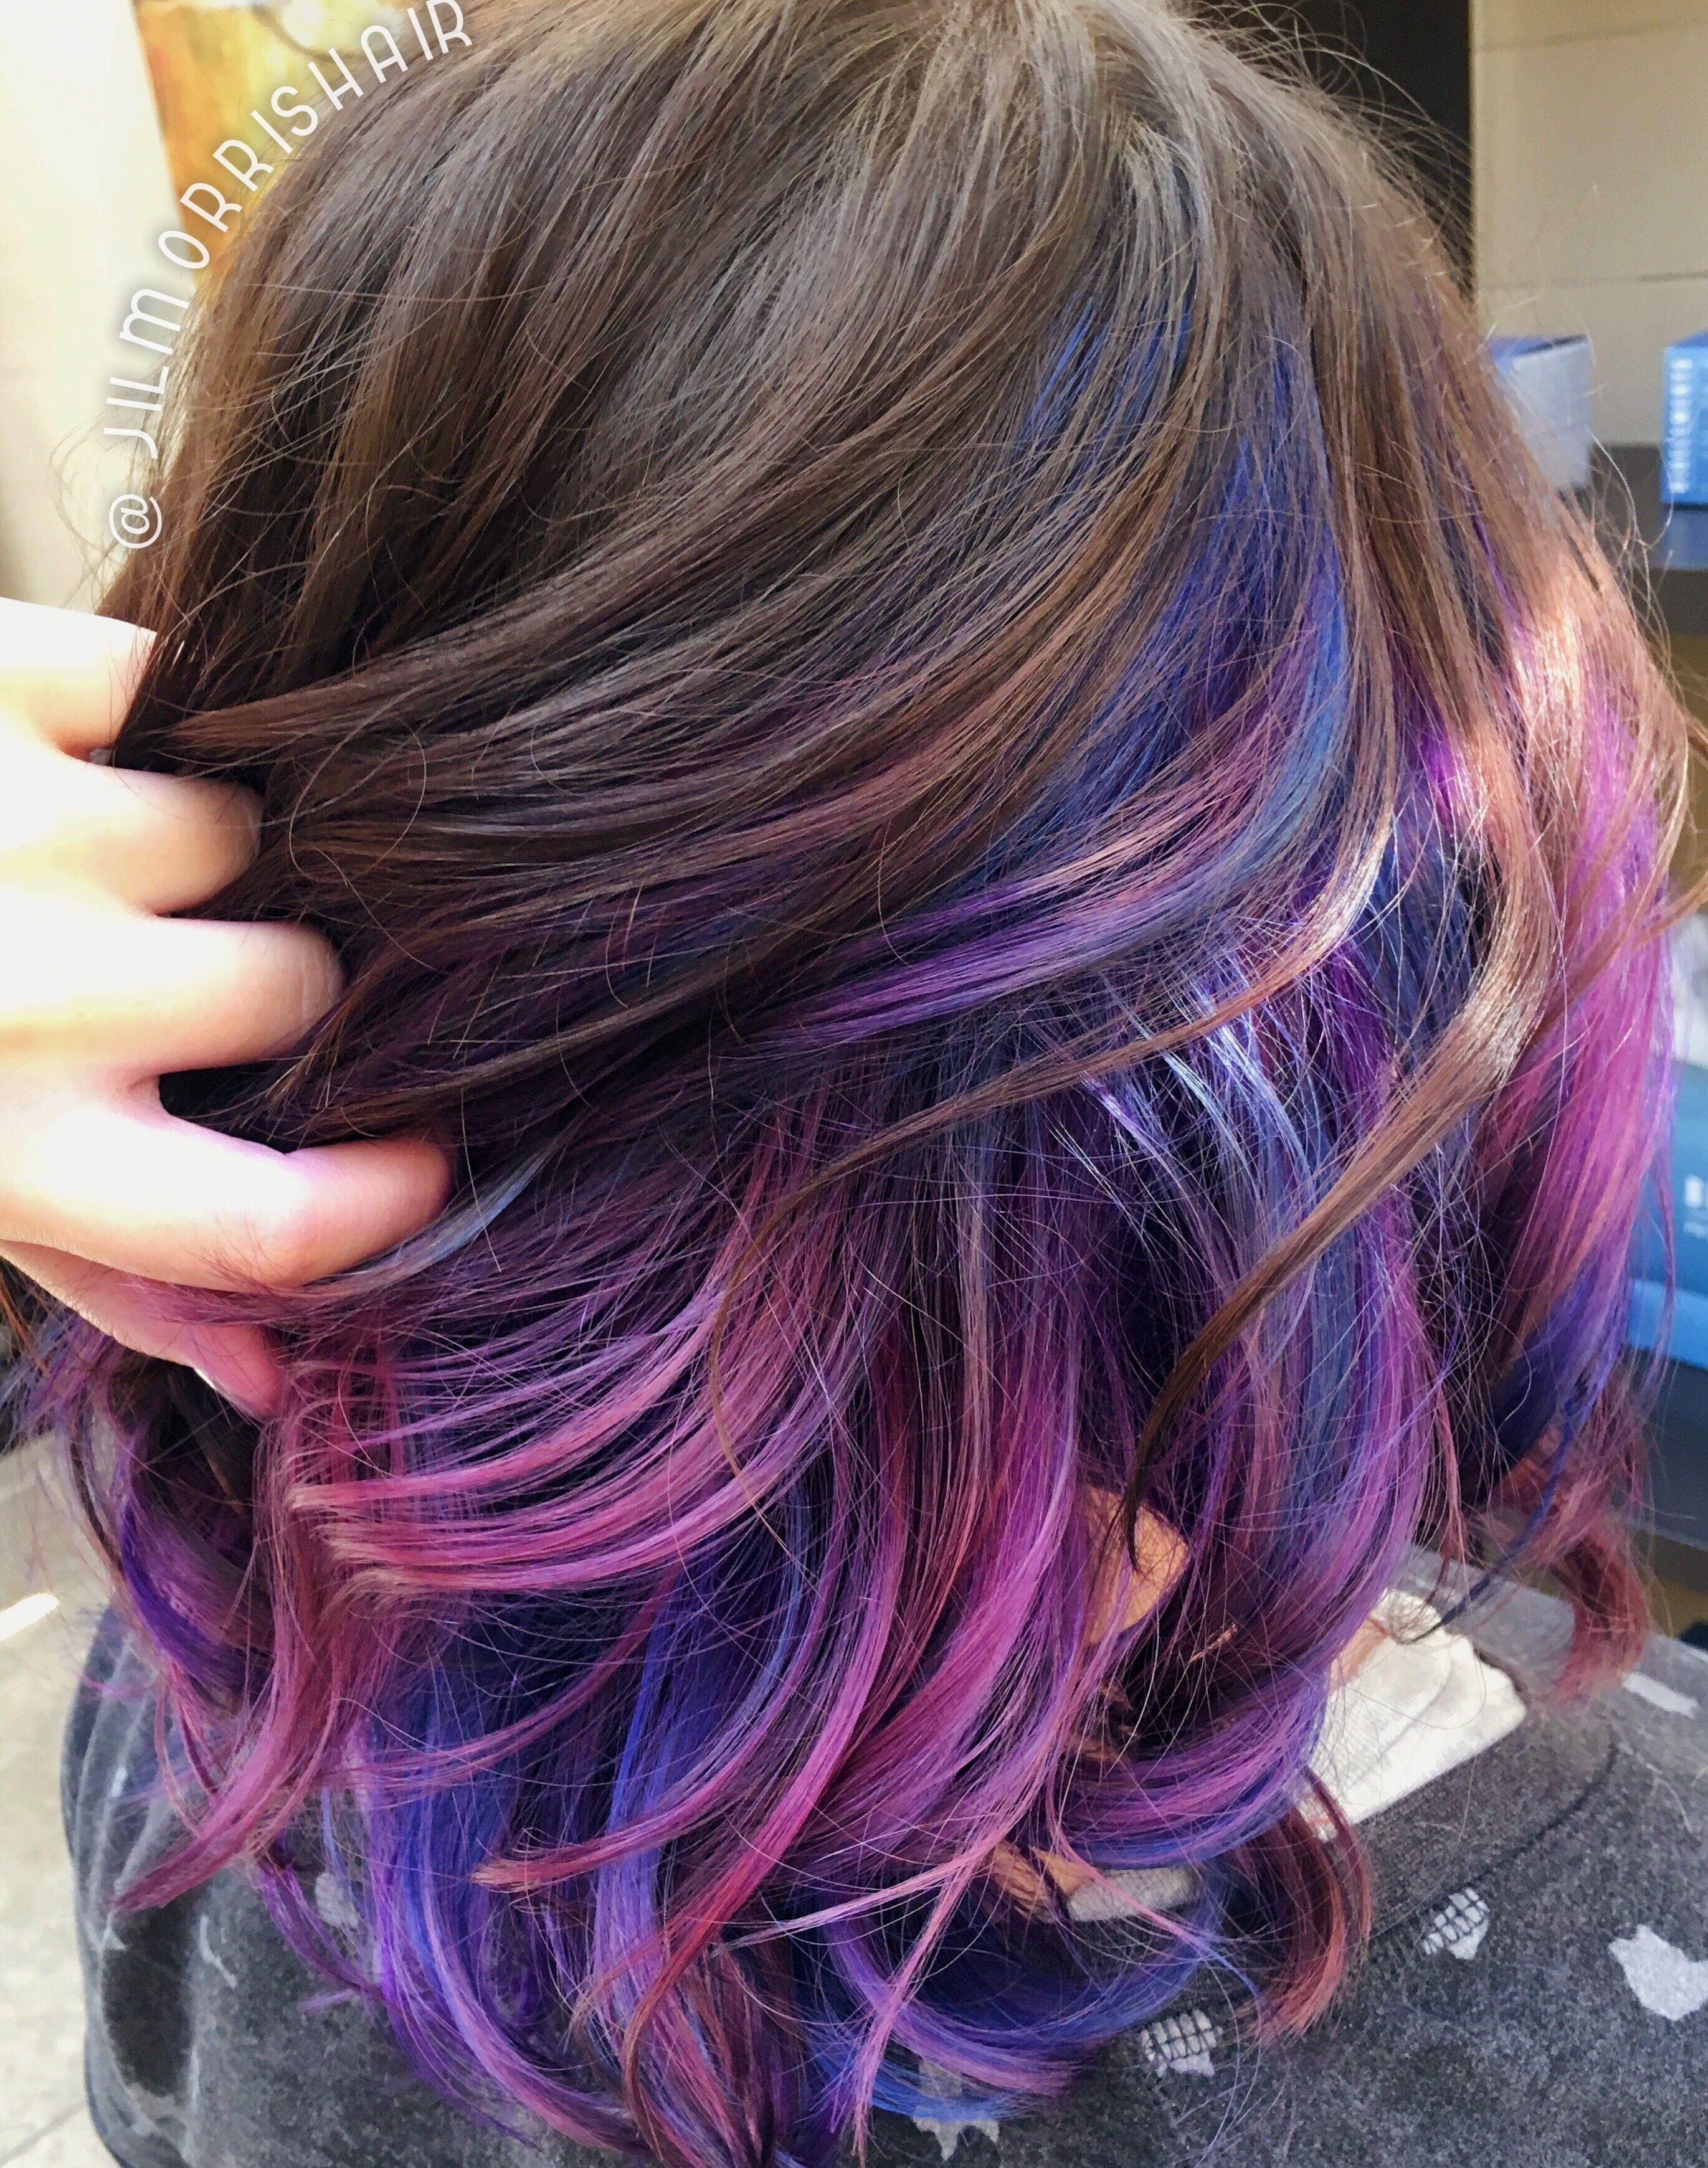 rainbow unicorn hair, purple, pink & blue underlights, joico